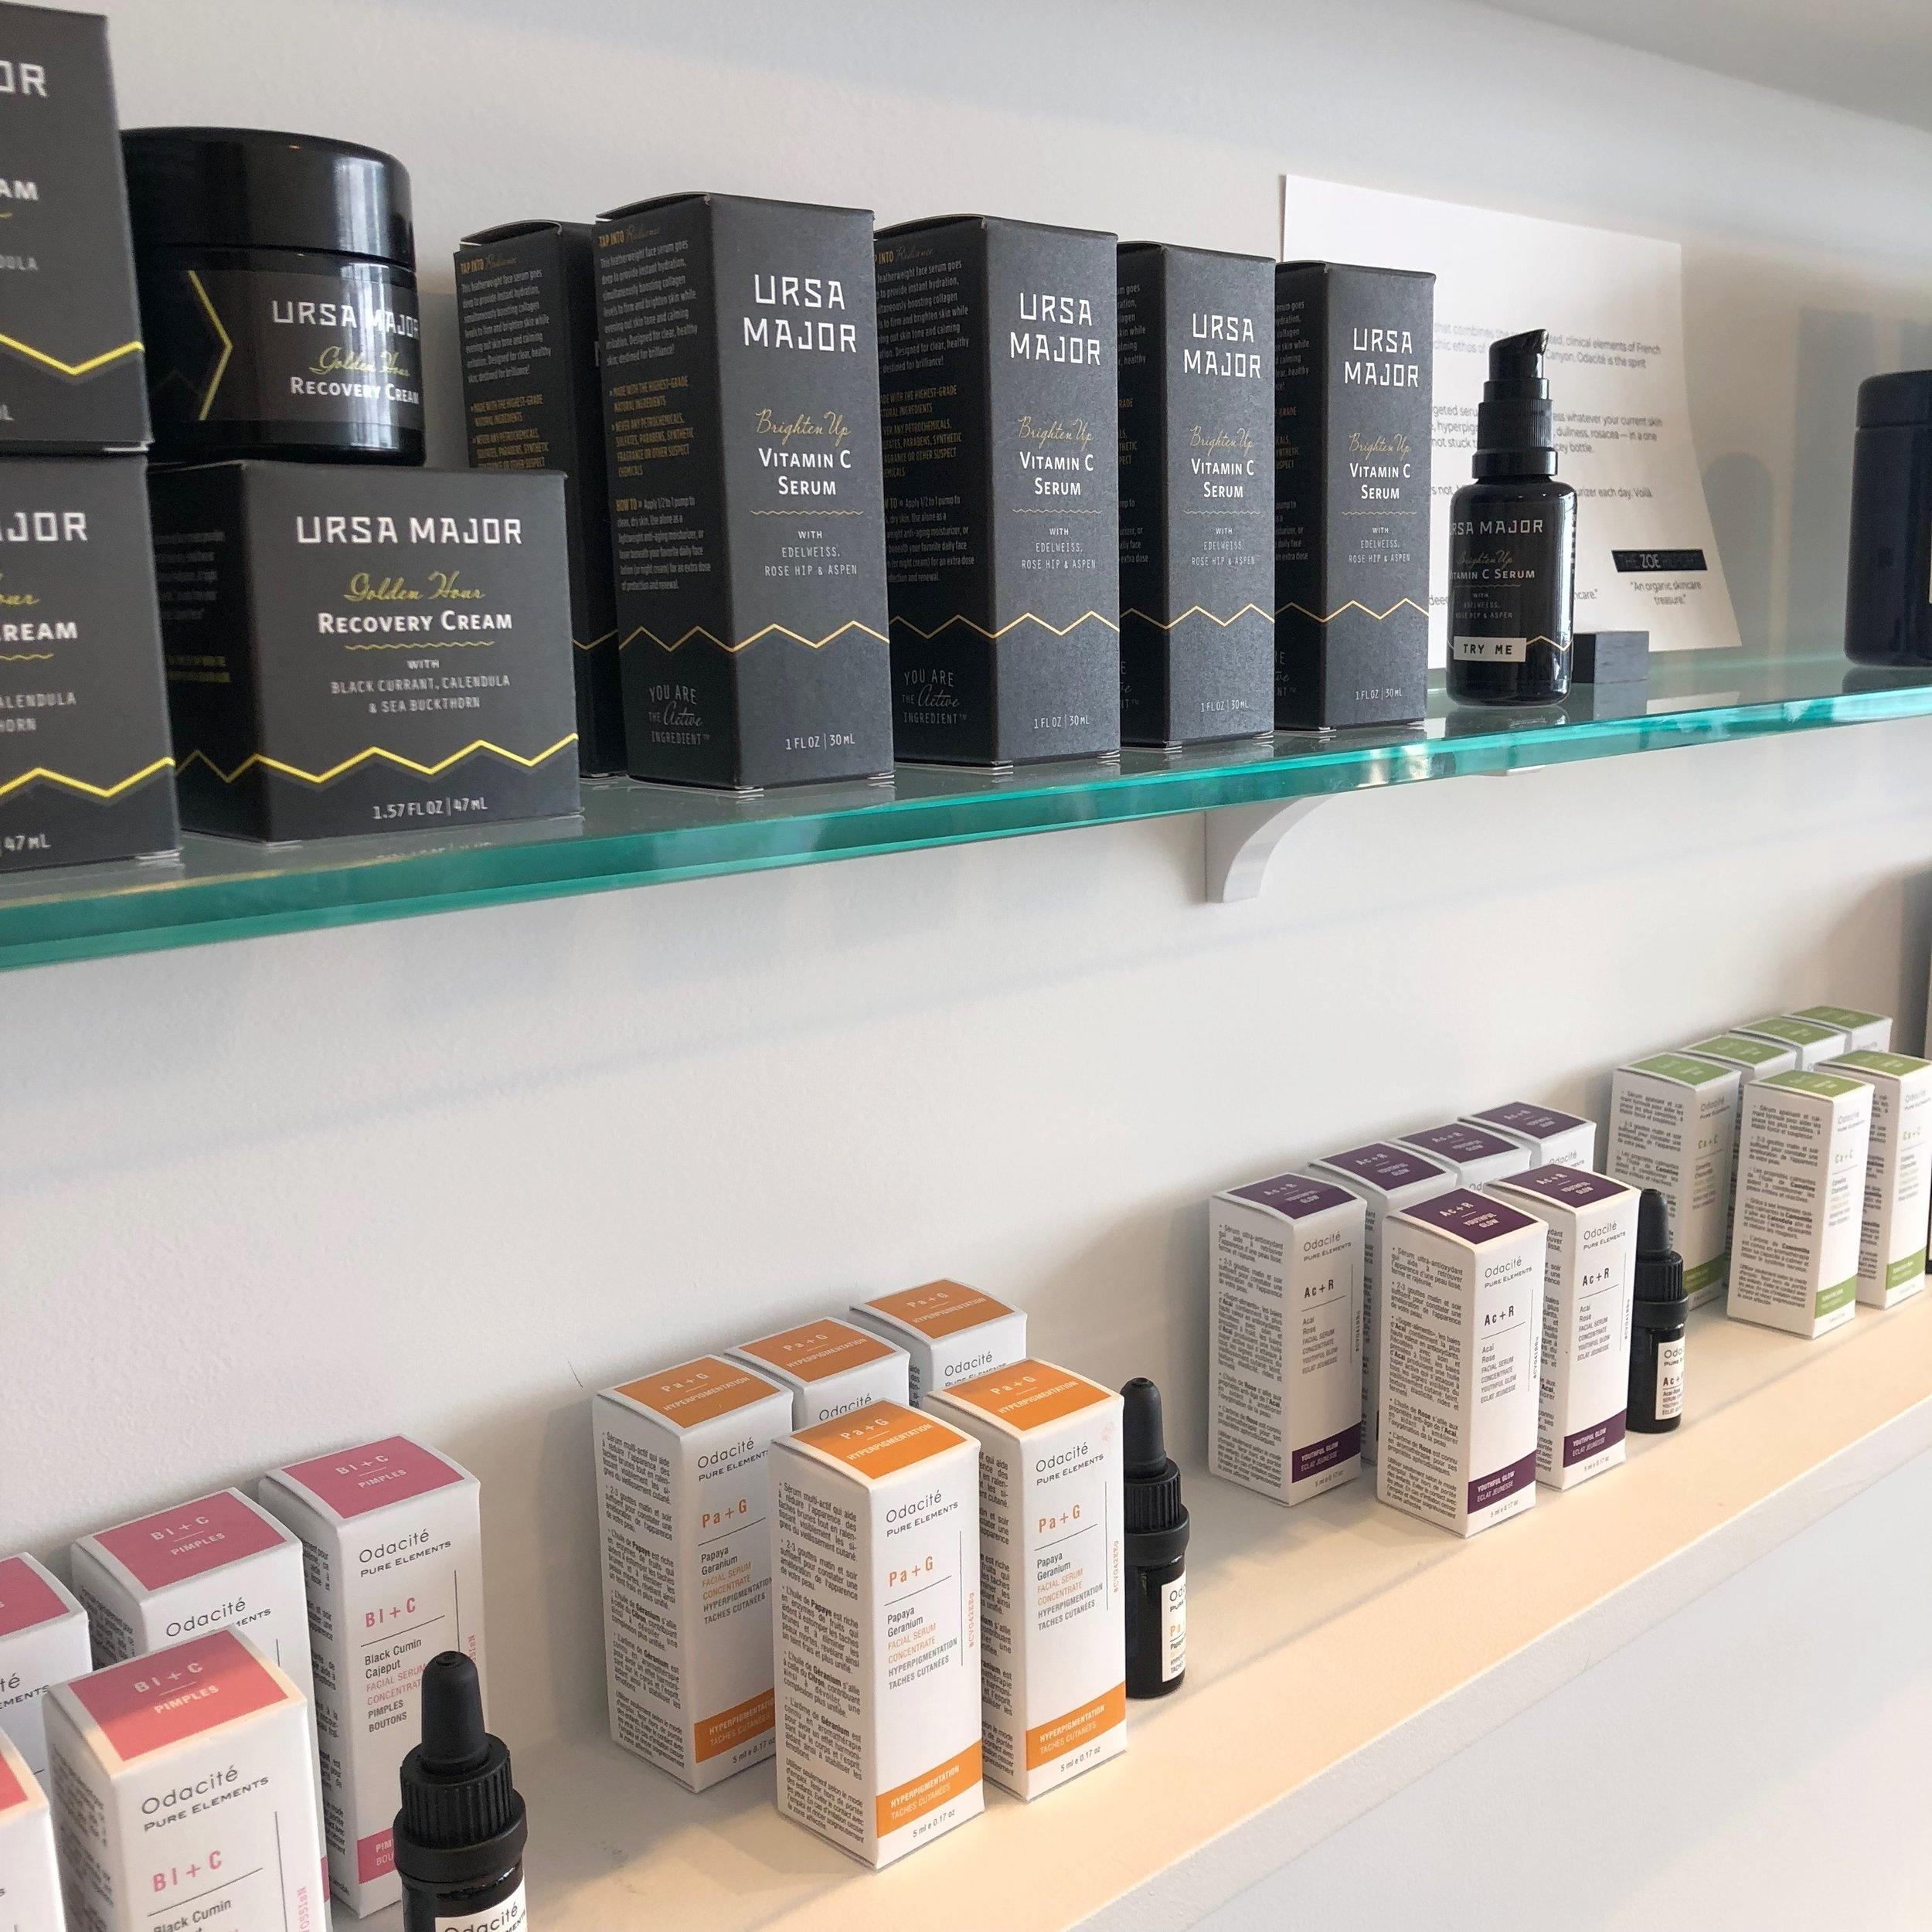 Ursa Major clean non-toxic skincare brand